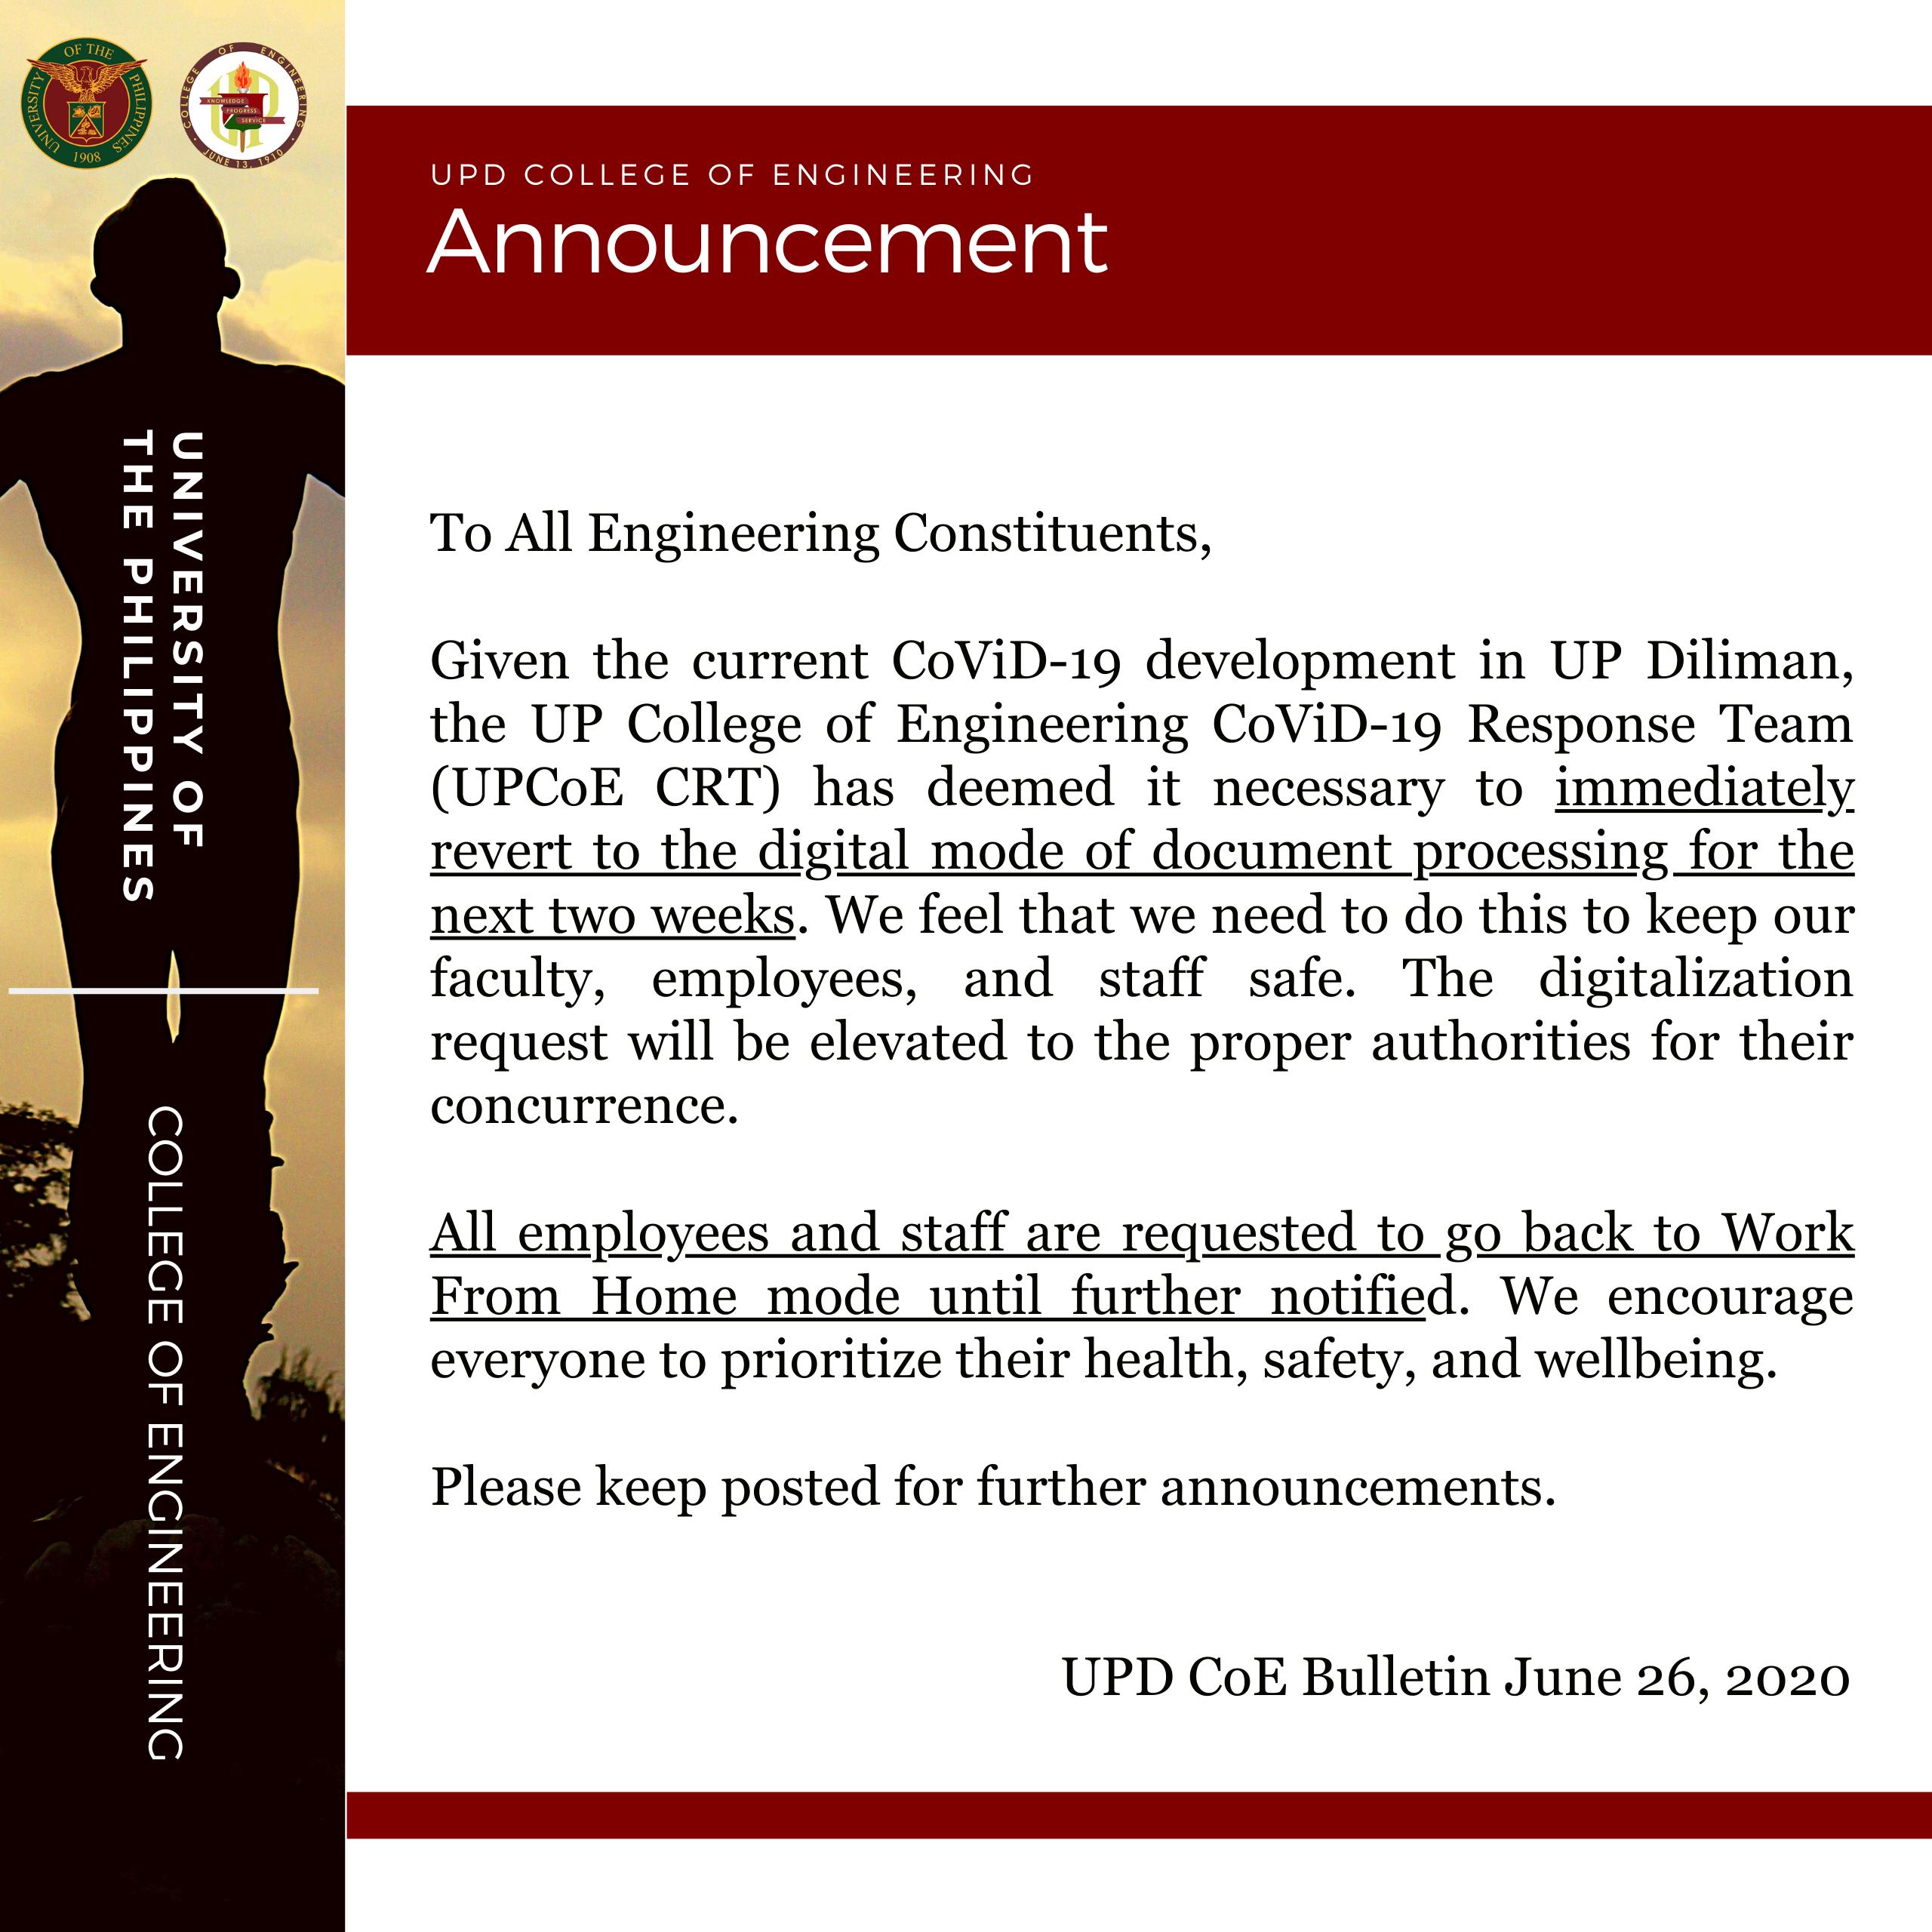 Announcement – UPD CoE Bulletin June 26, 2020